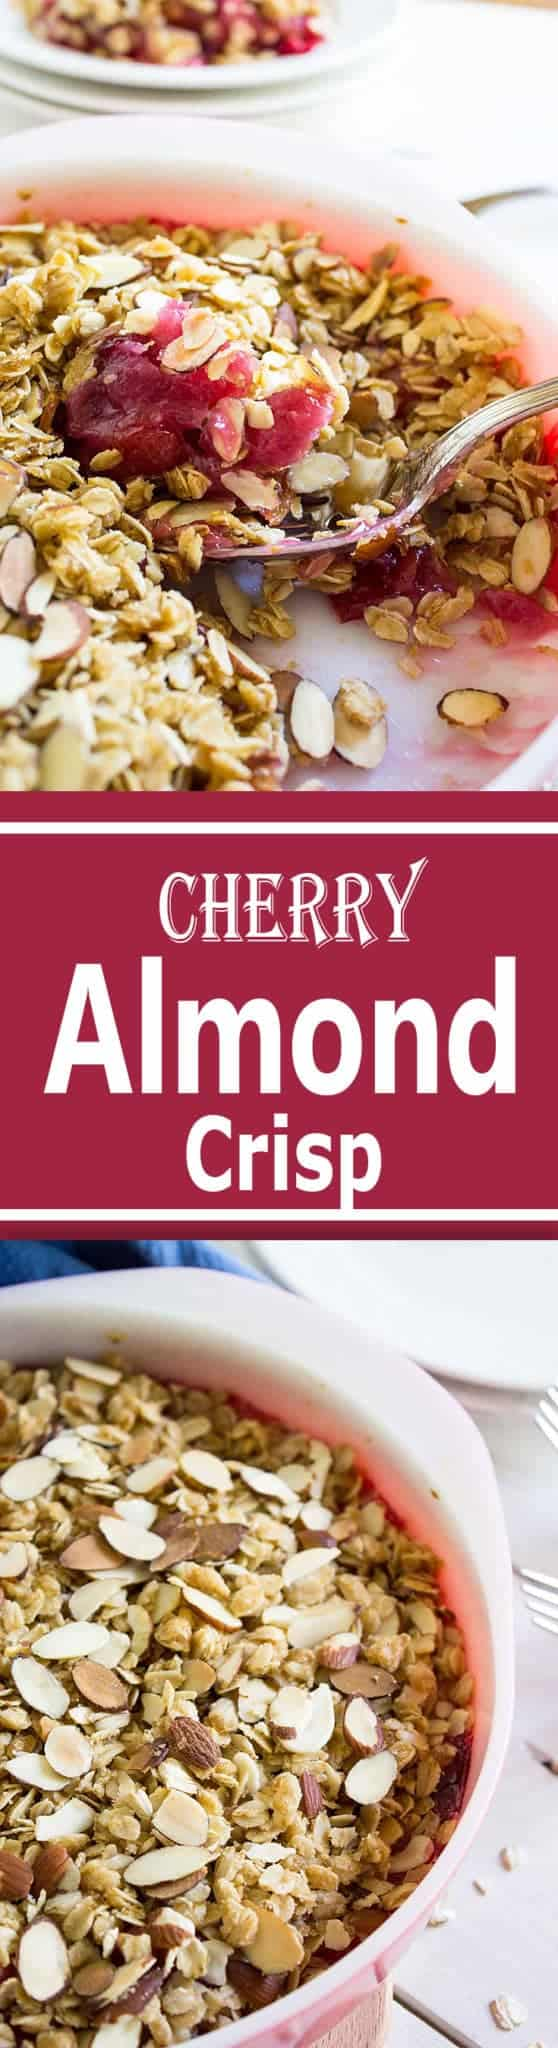 Cherry Almond Crisp ~ beyondthechickencoop.com